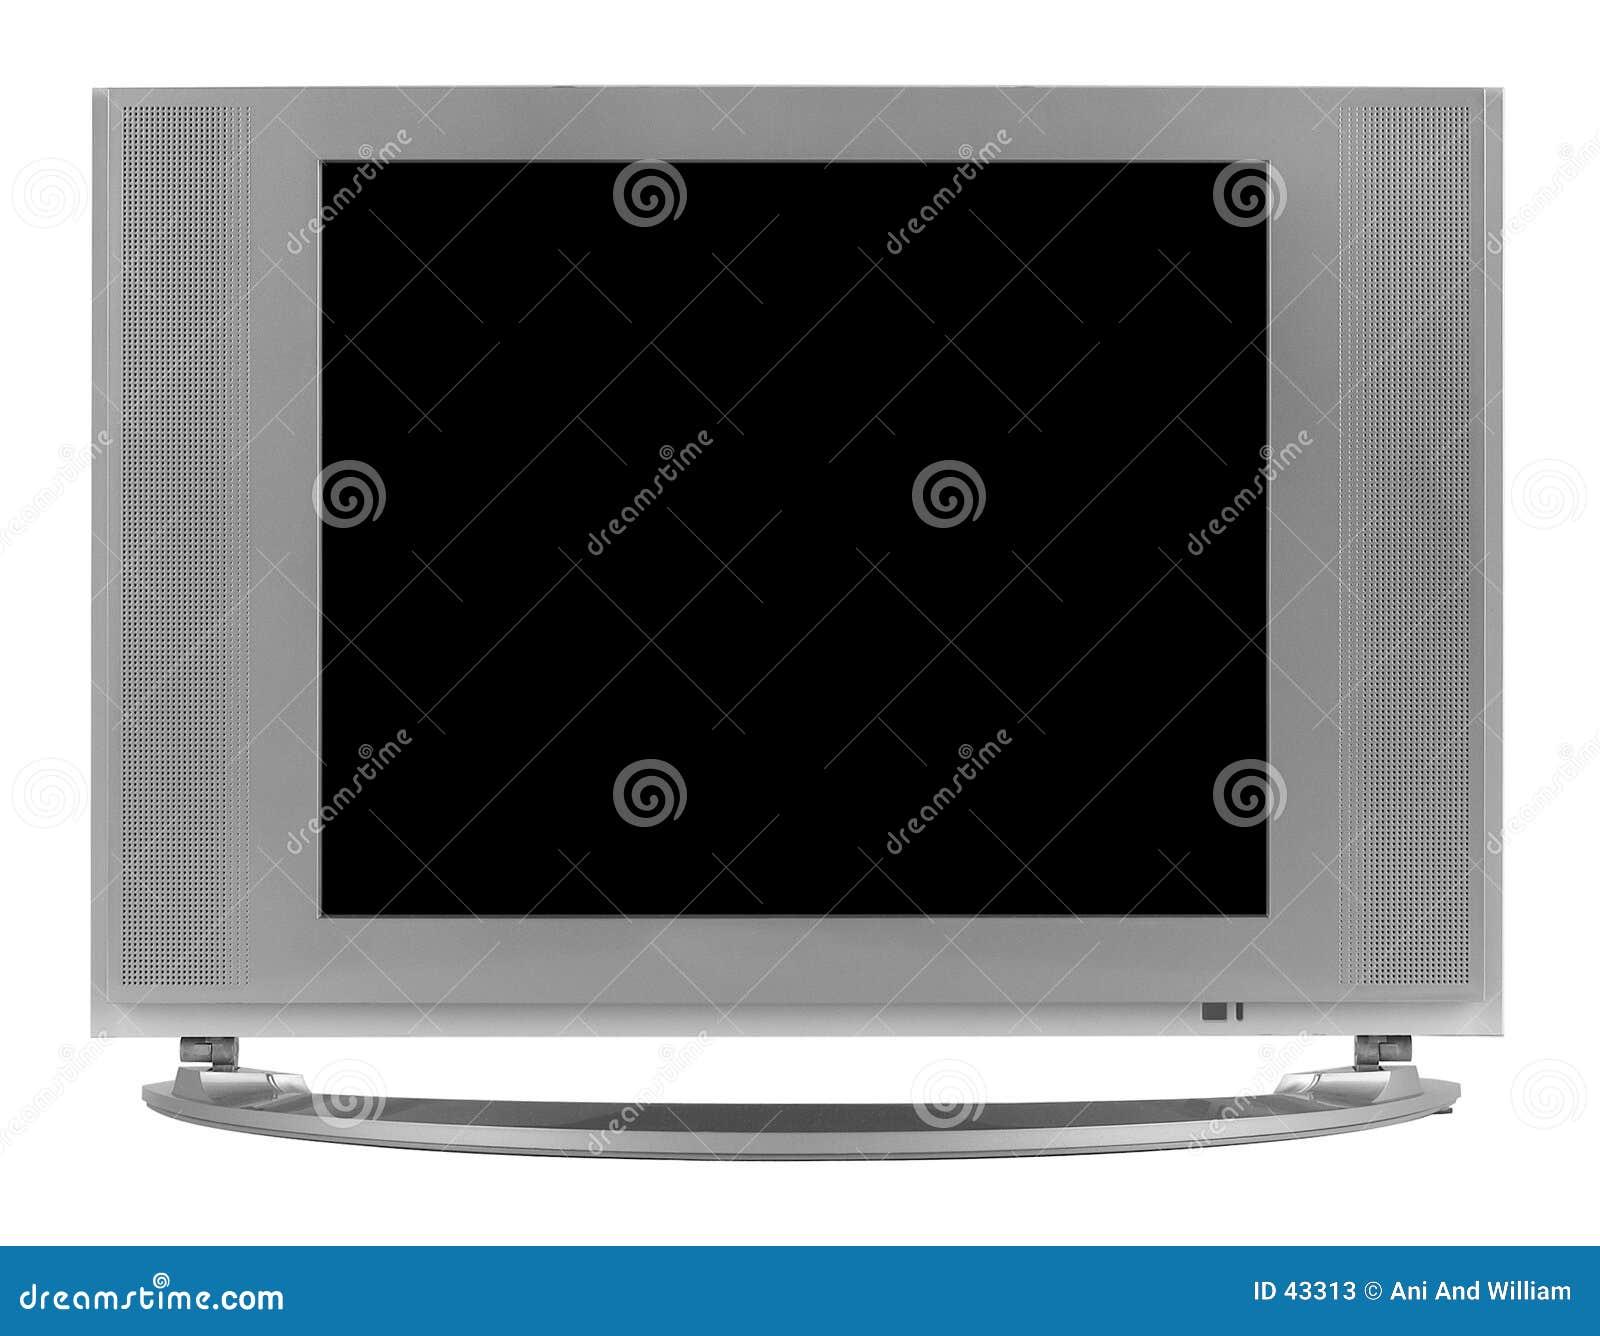 LCD high definition flat screen TV